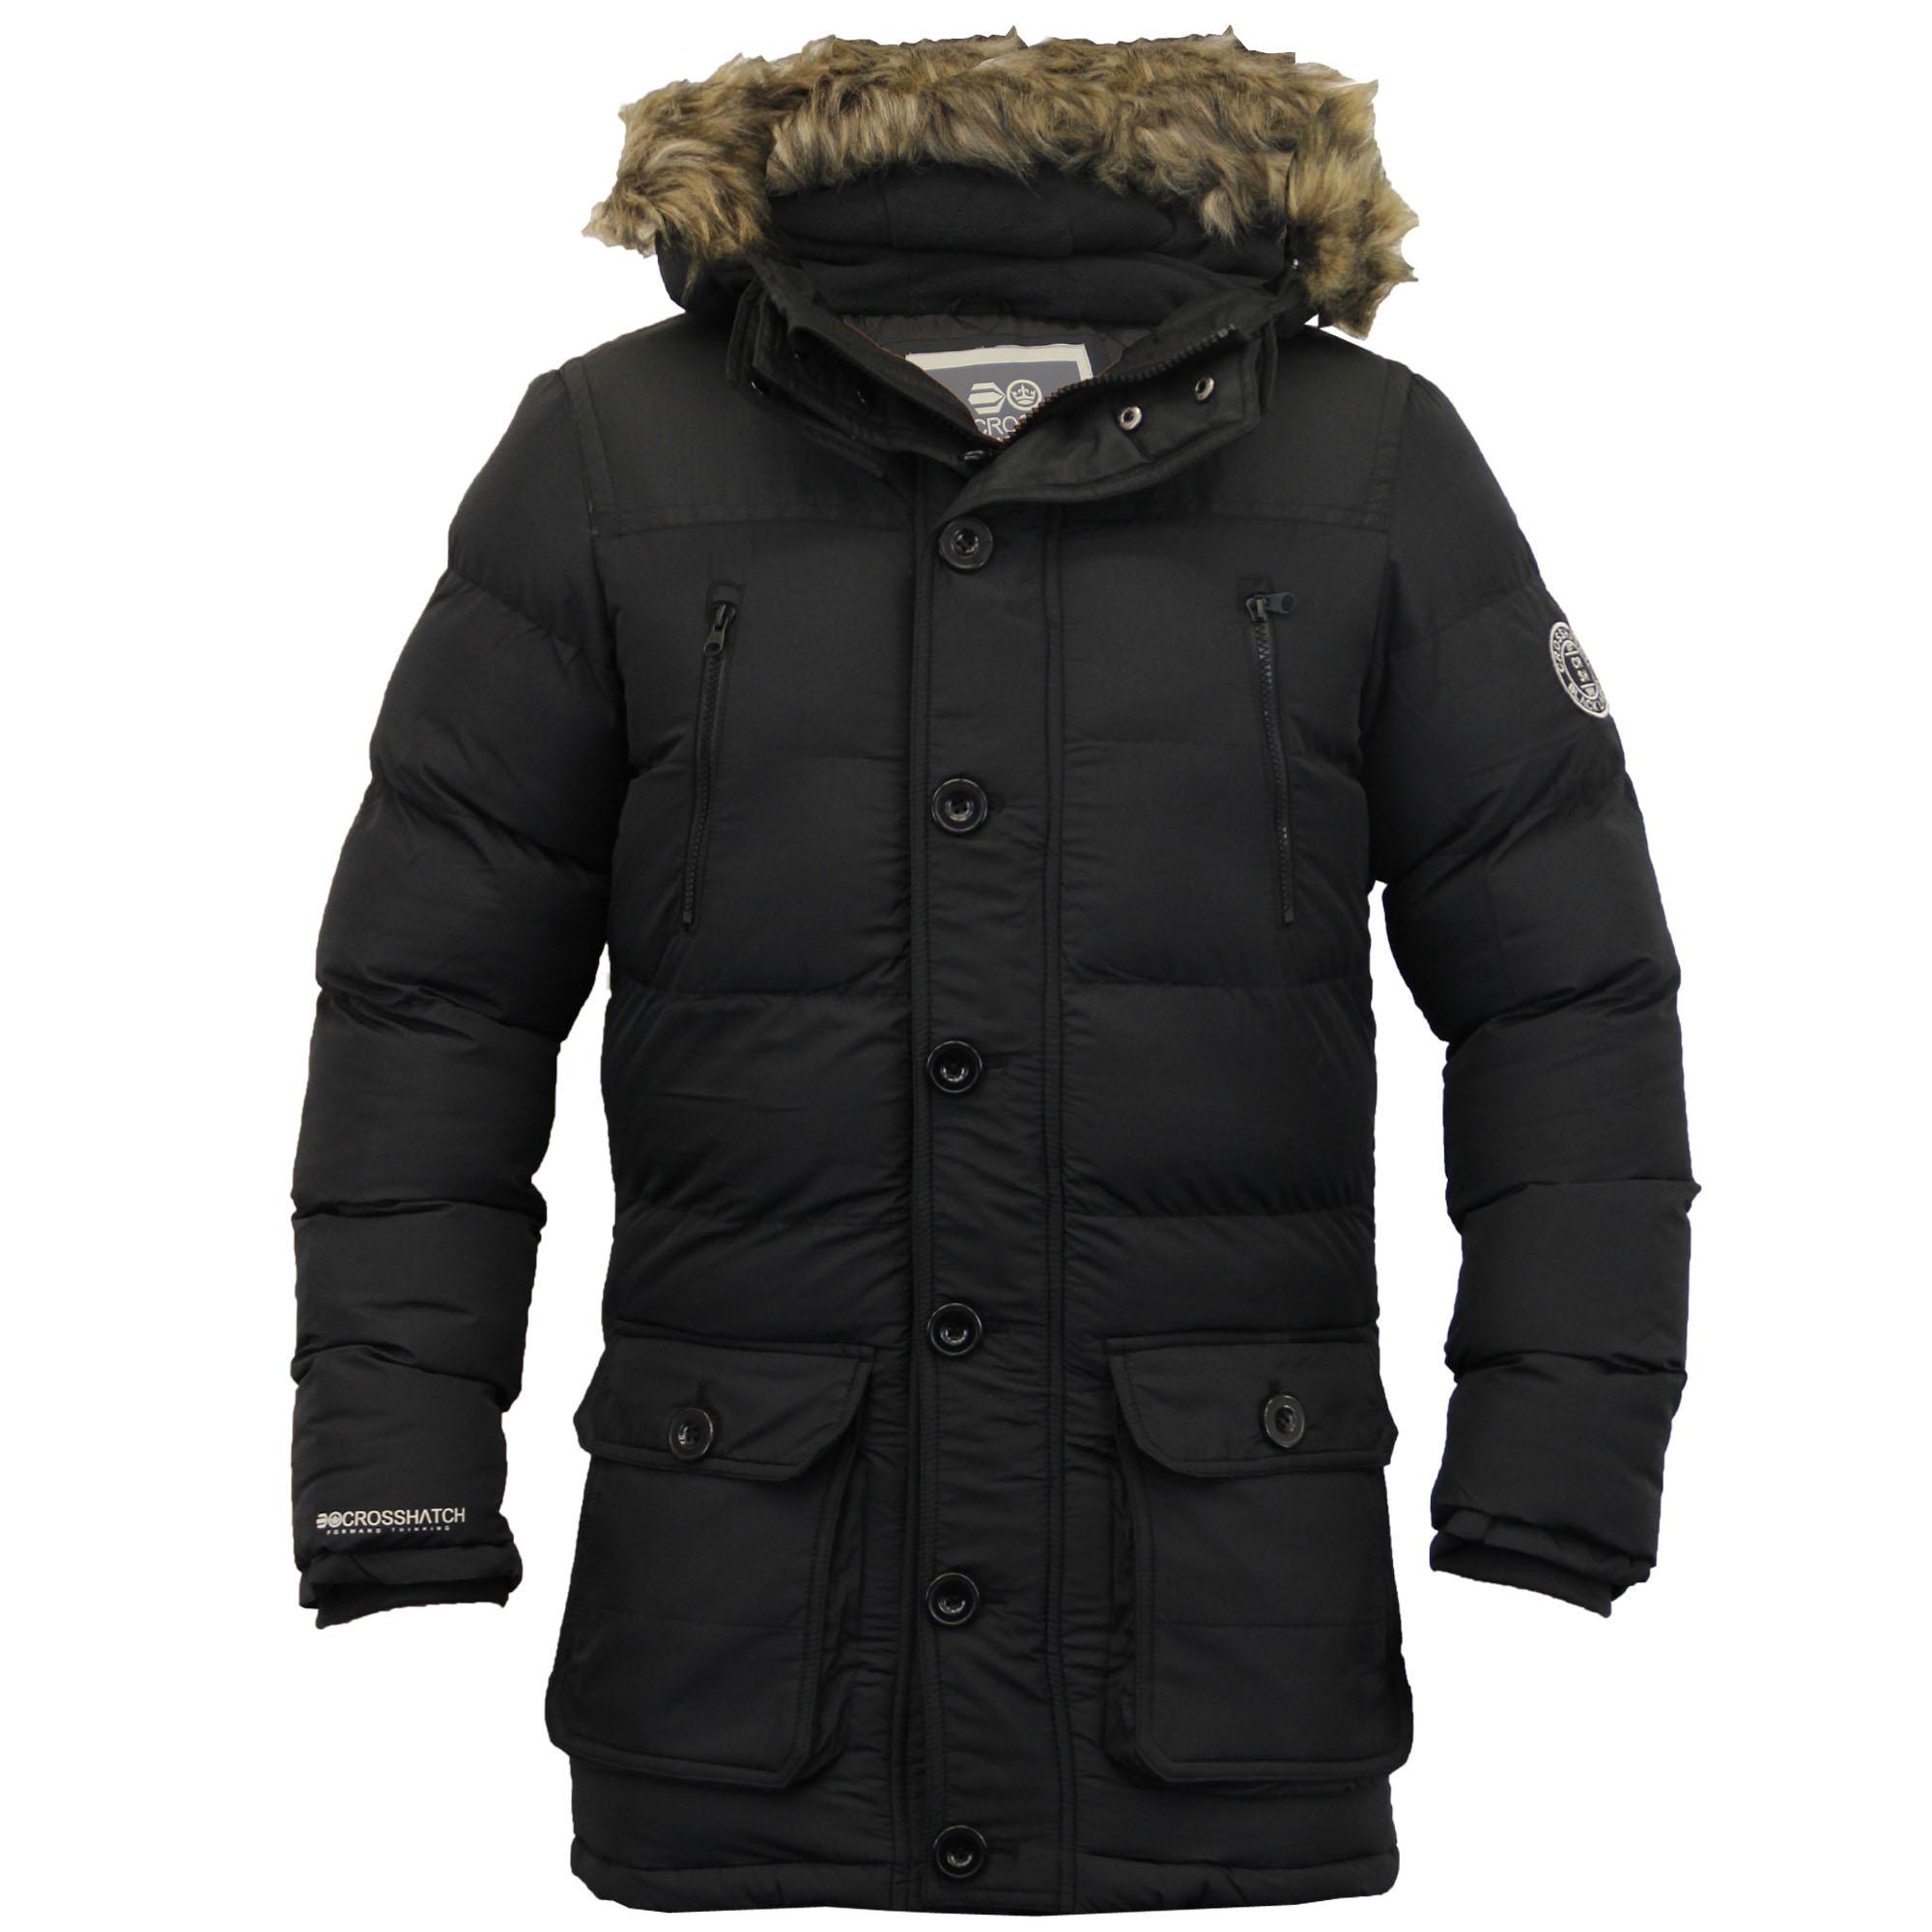 need for men s parka coats styleskier #0: mens parka coats mens parka jacket crosshatch coat hooded padded quilted vehvrwq